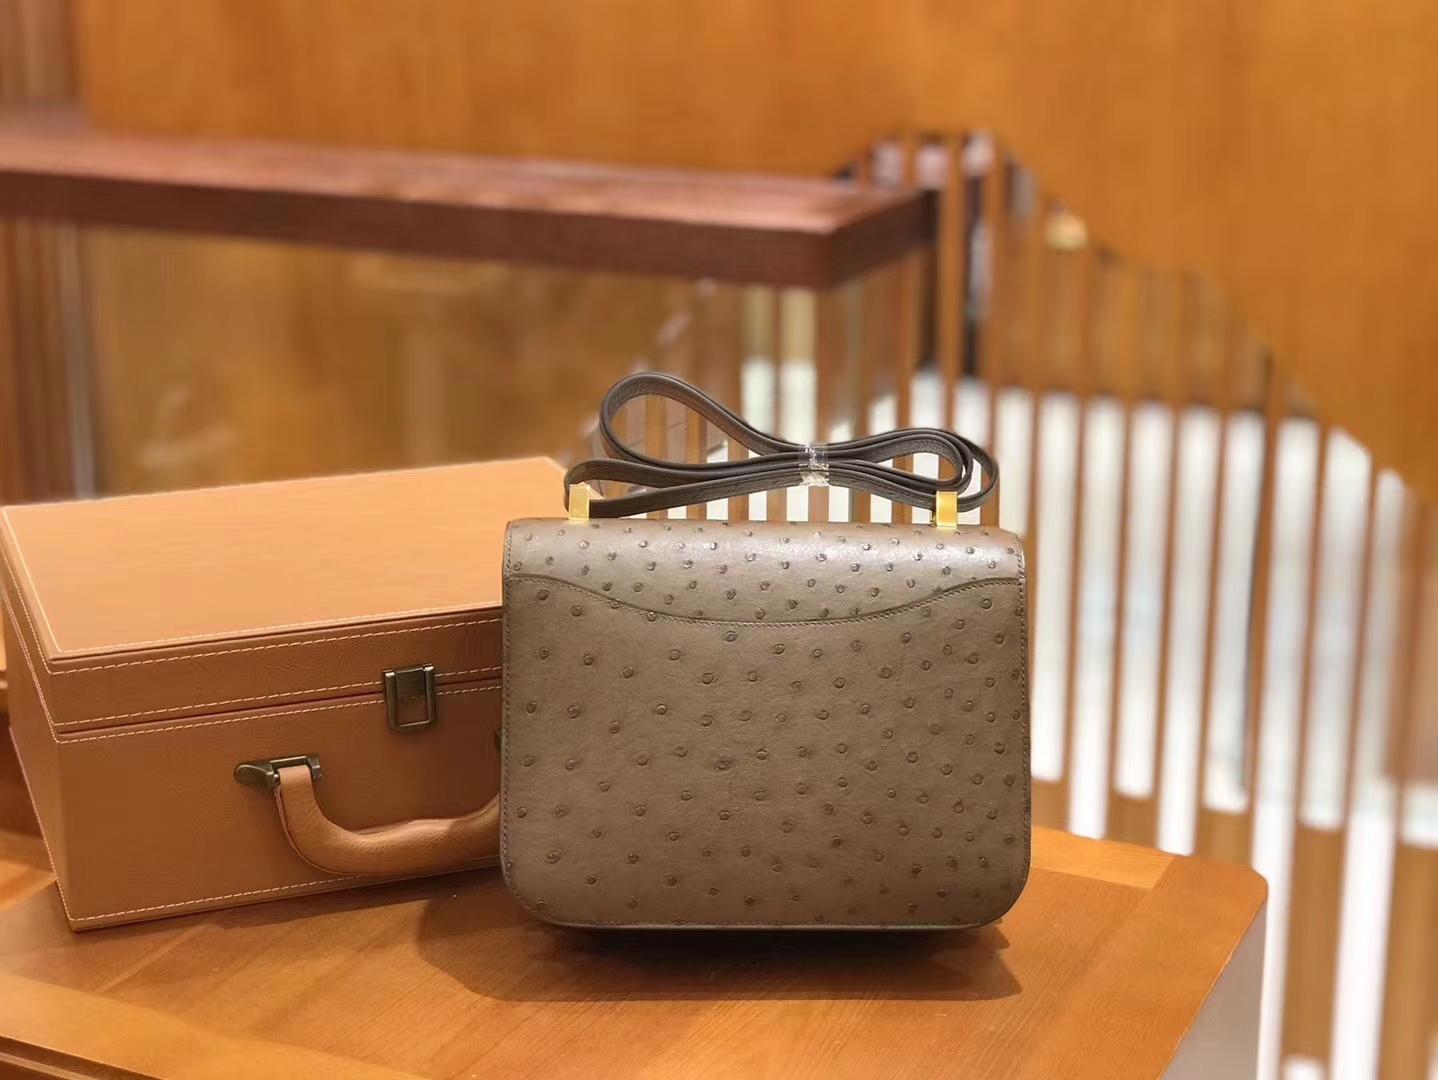 Hermès(爱马仕)Constance 23cm 大象灰 南非KK级鸵鸟皮 金扣 原版蜜蜡线 顶级手缝